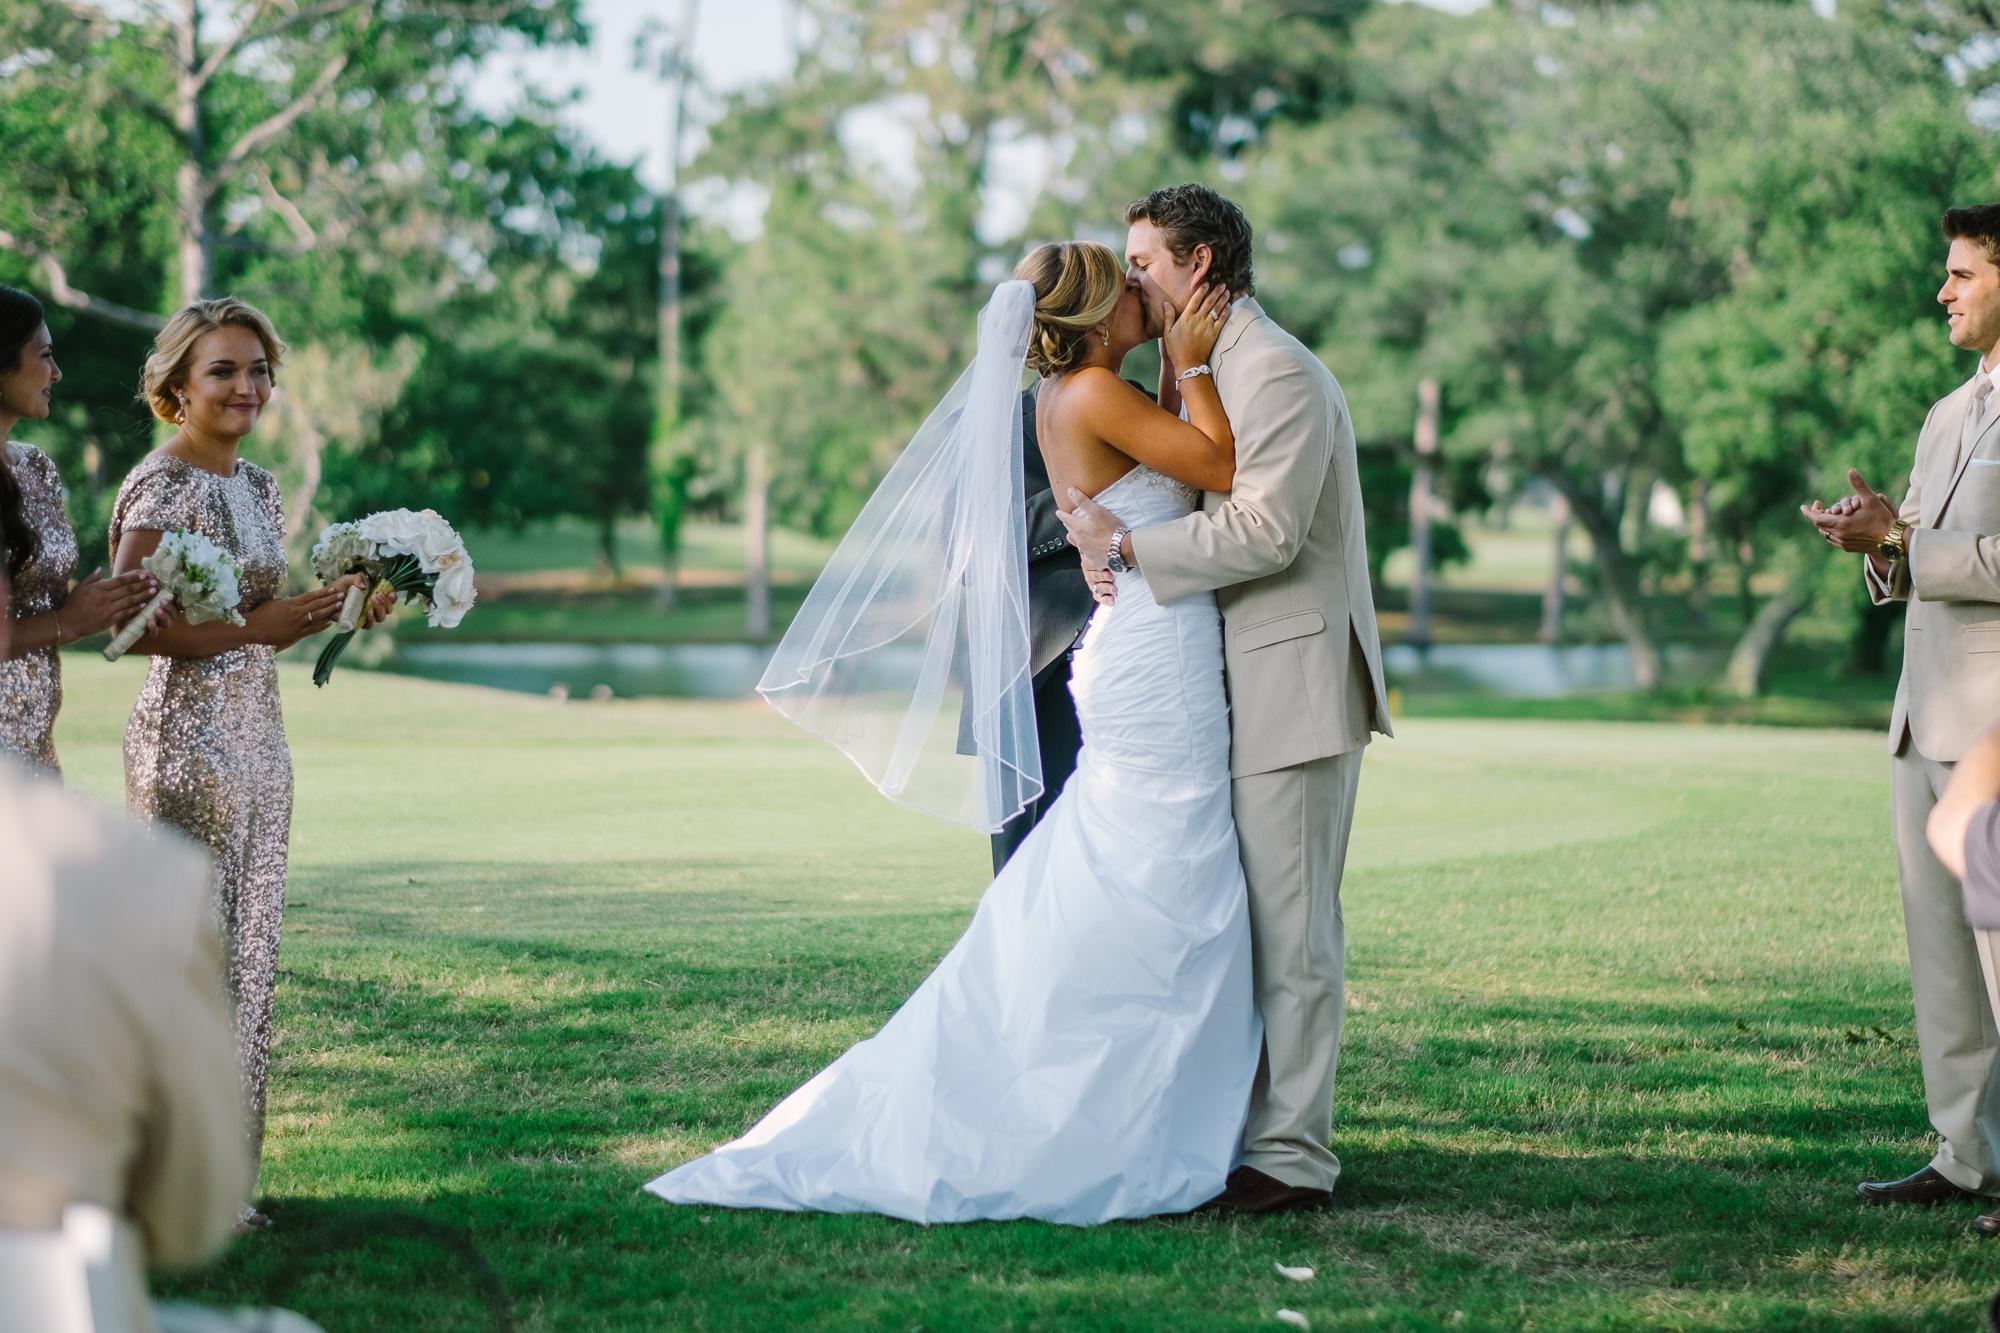 Heather-Chris-wedding-blog-22.jpg